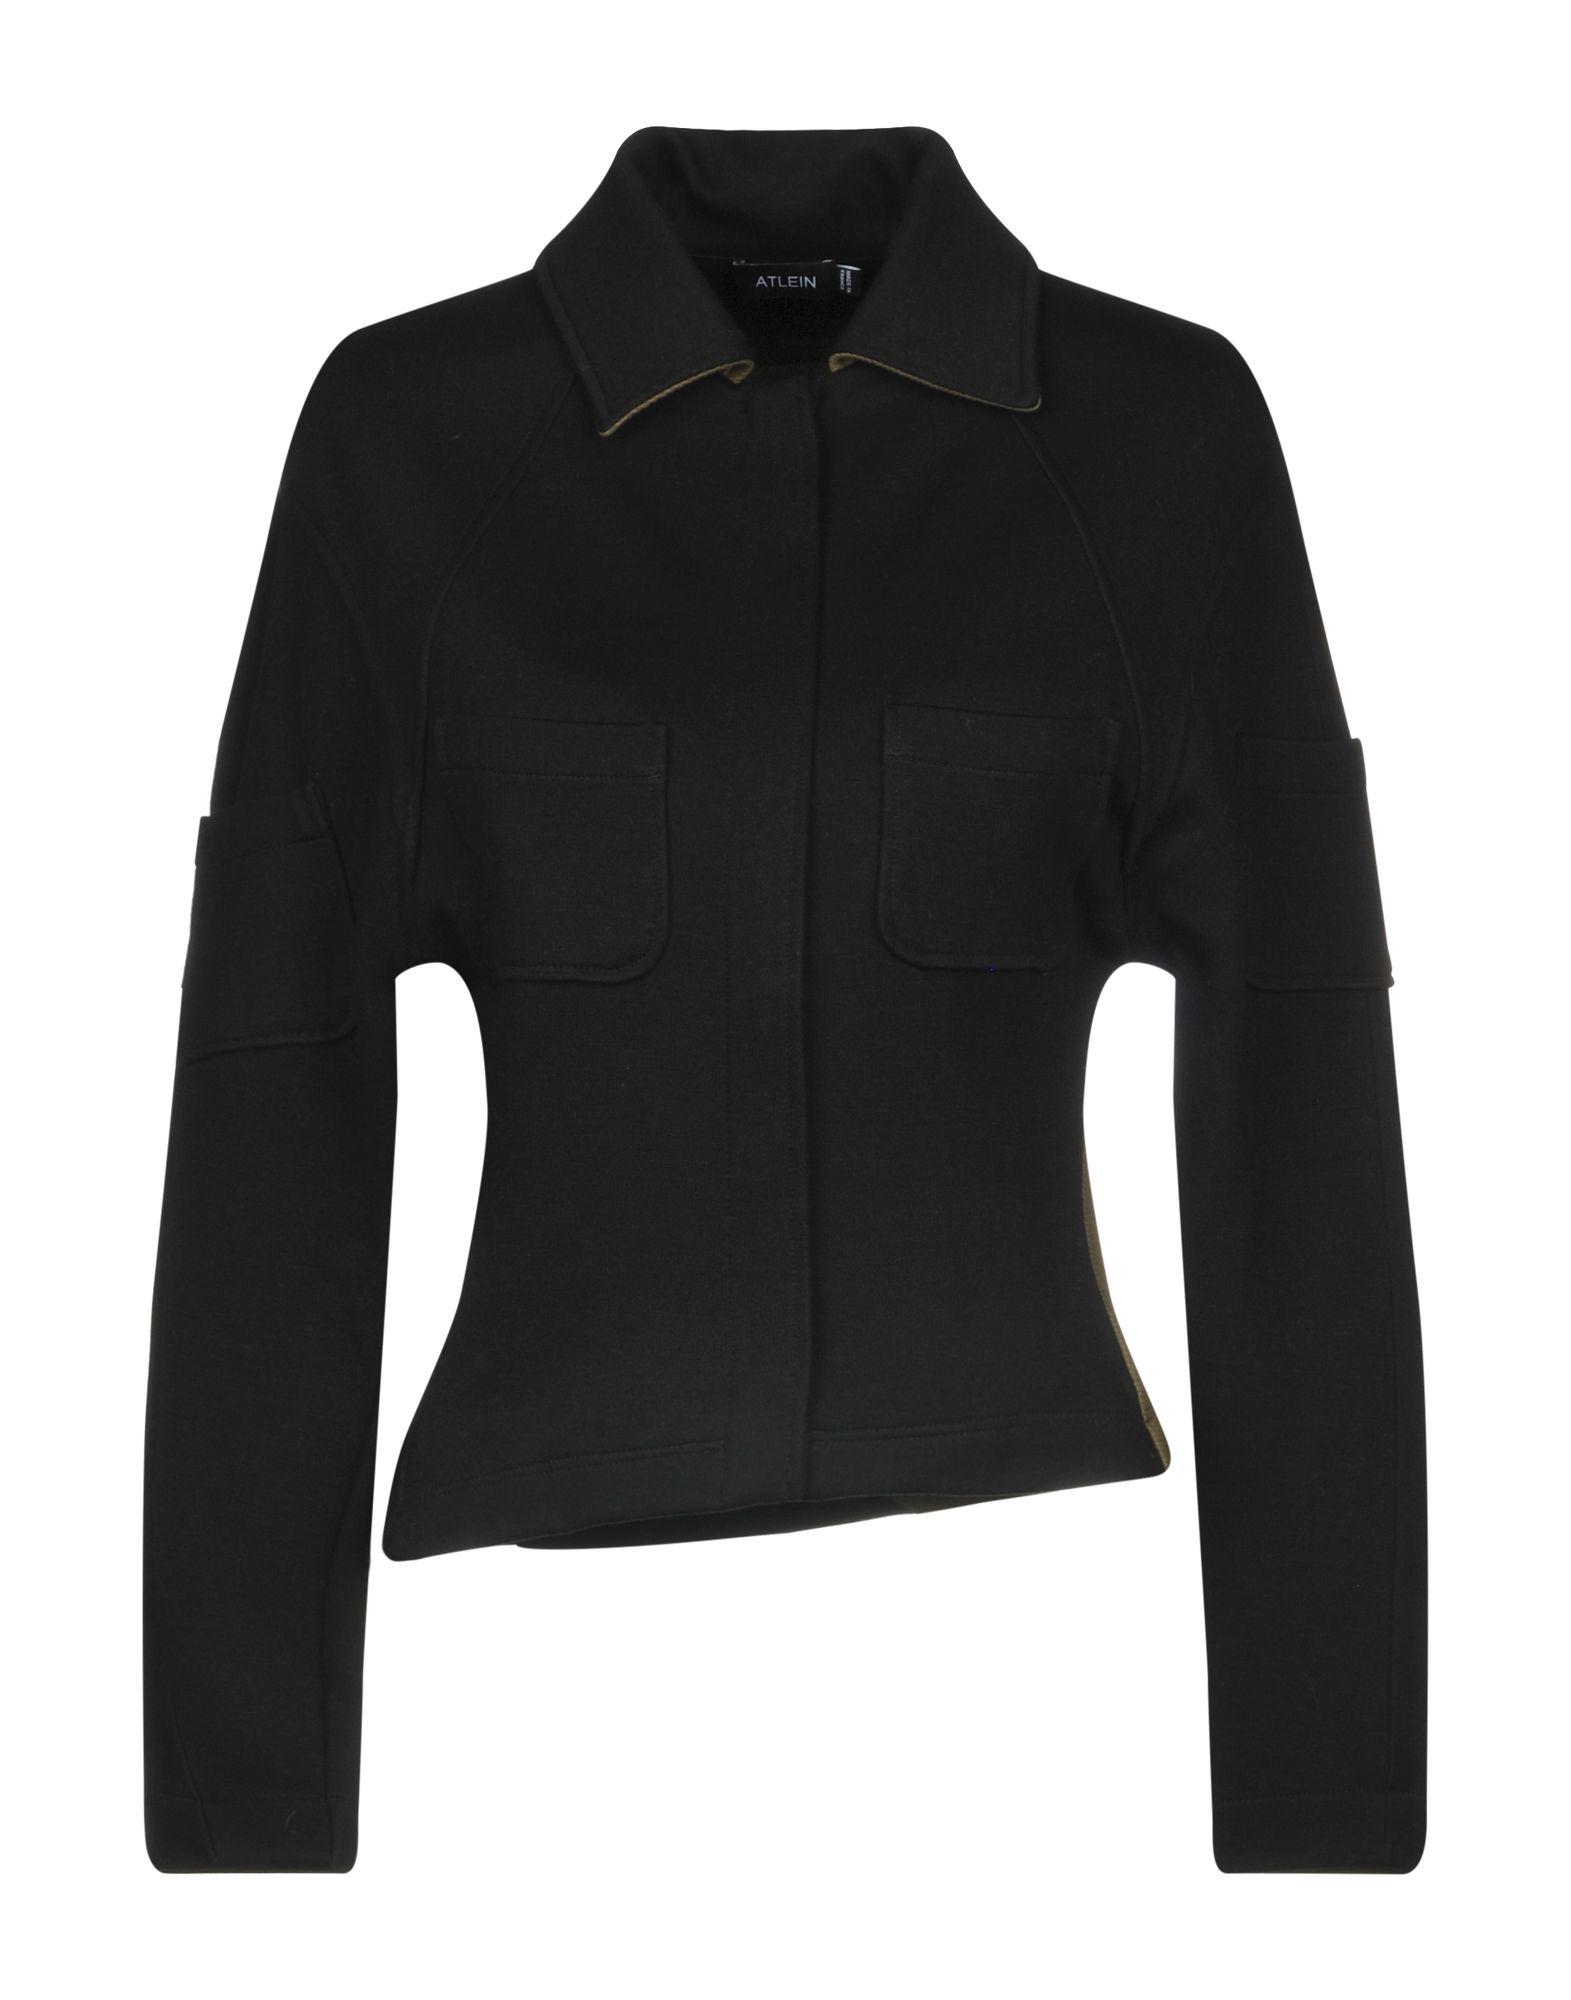 ATLEIN Sweatshirt in Black